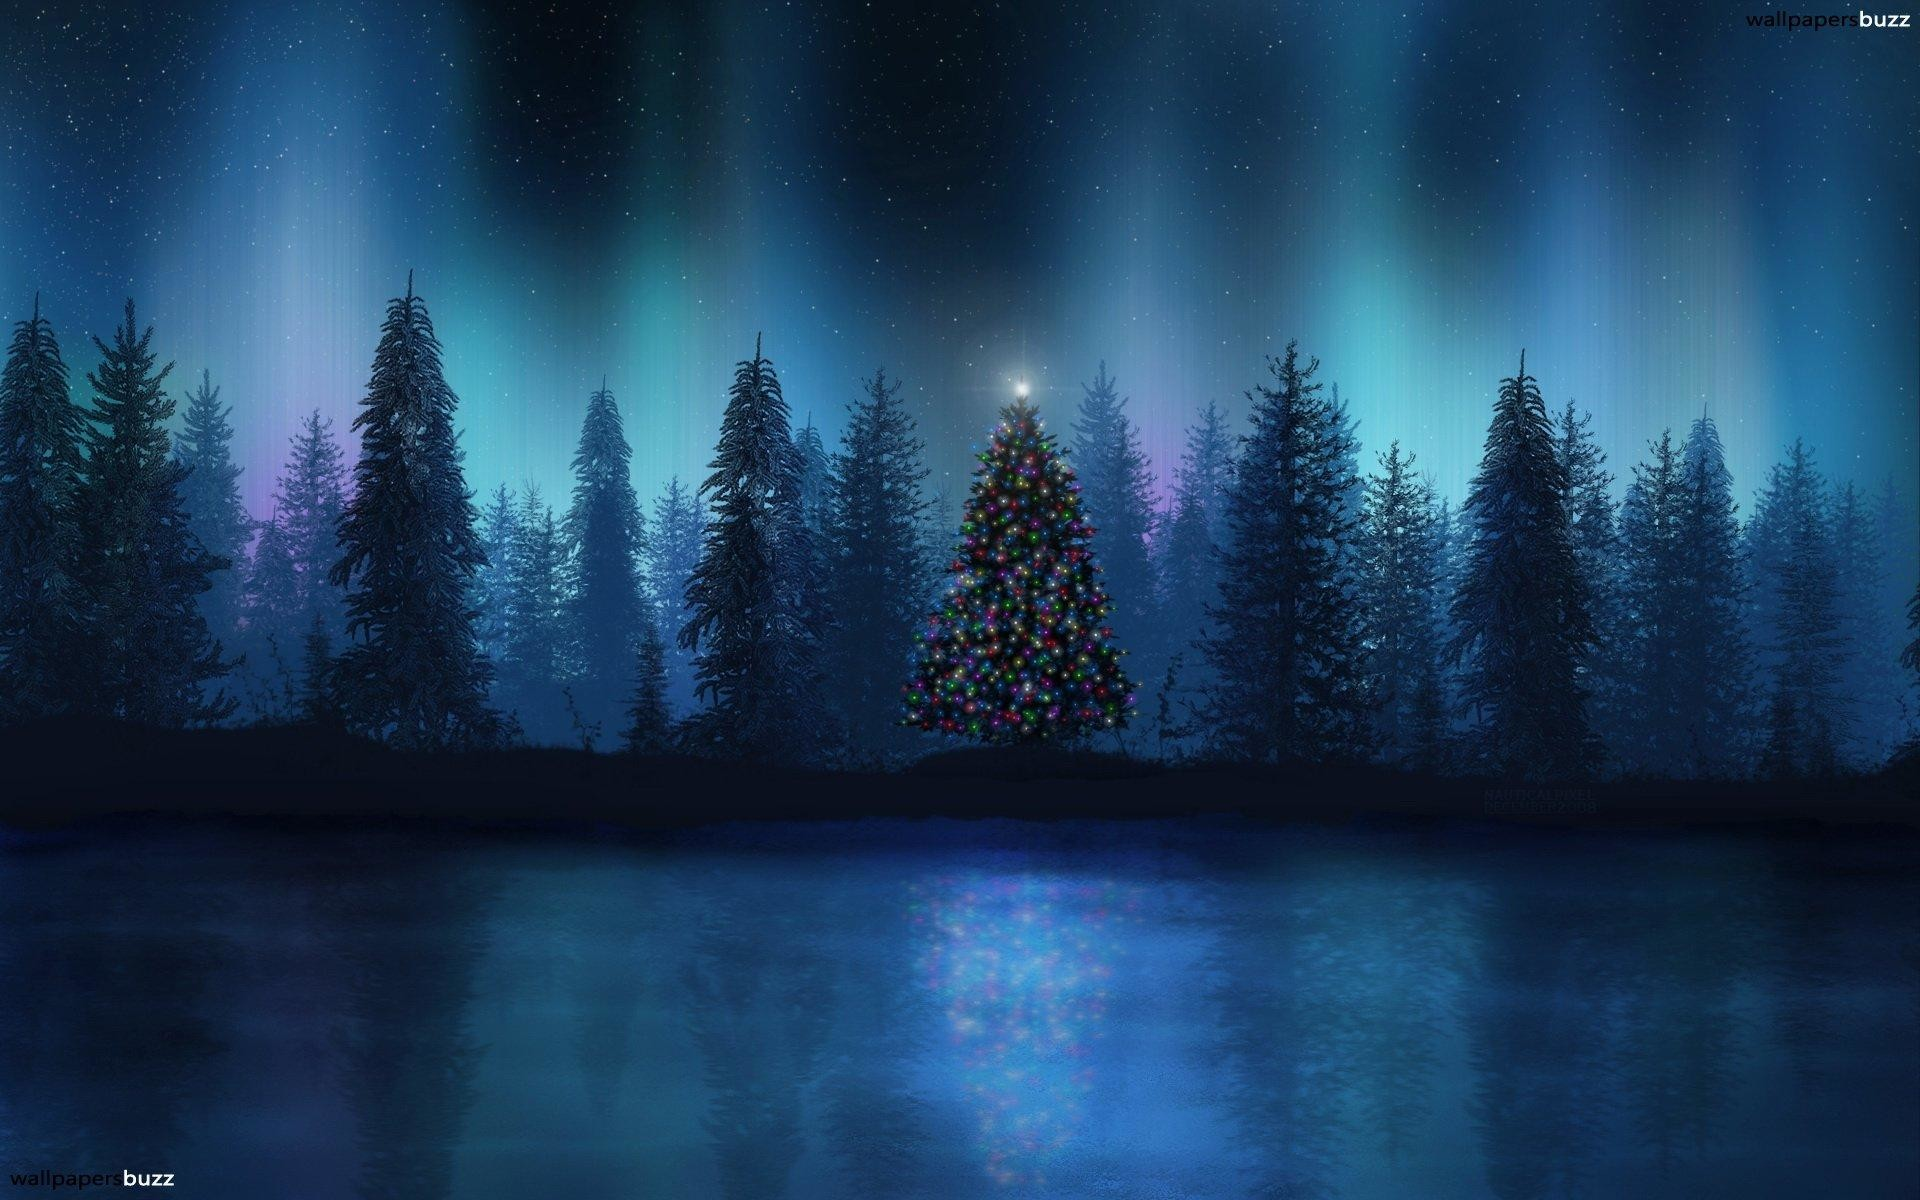 Beautiful-Christmas-tree-wallpaper-wp400596